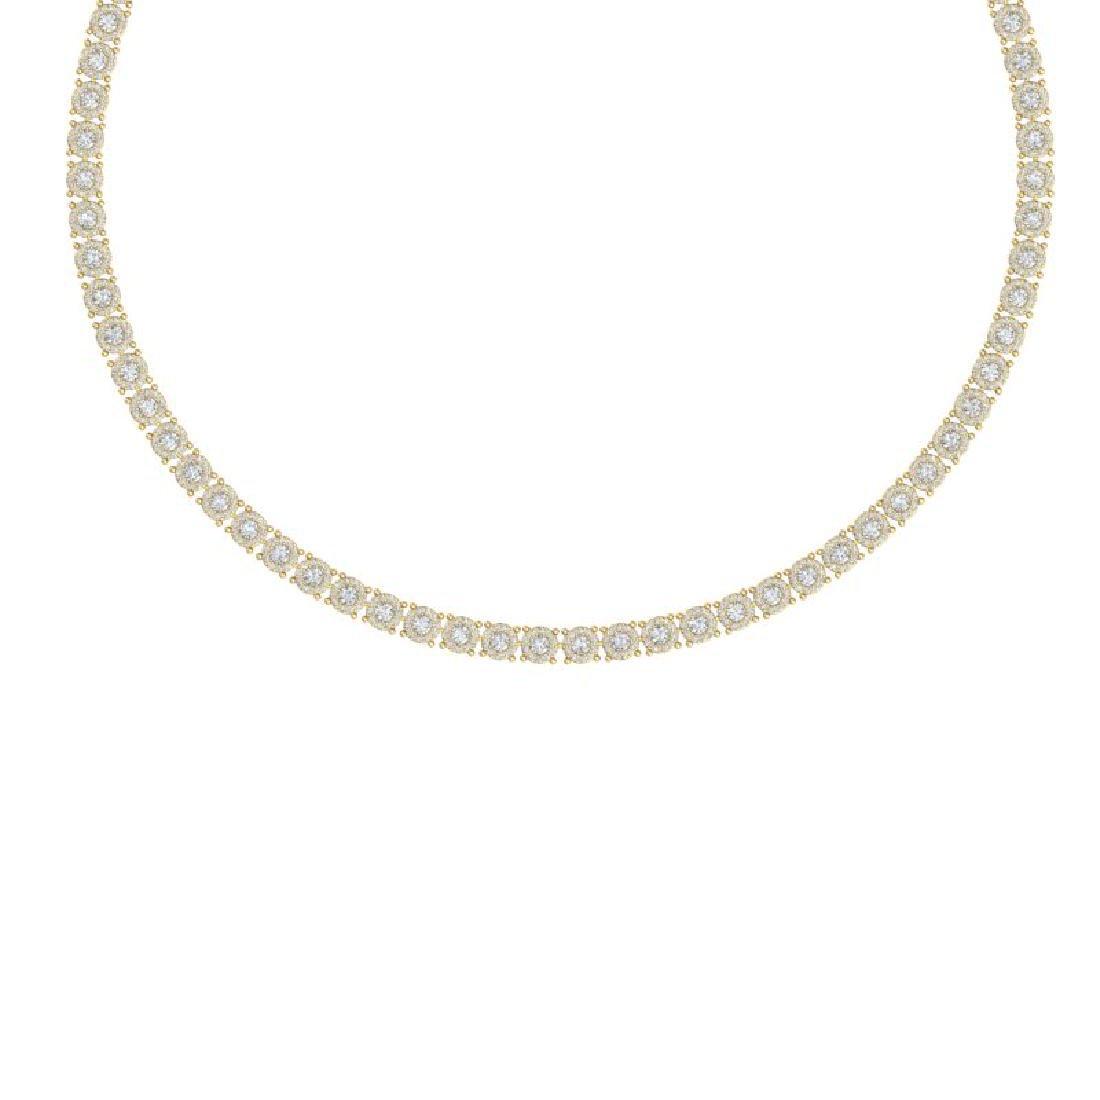 12 CTW Certified SI/I Diamond Halo Necklace 18K Yellow